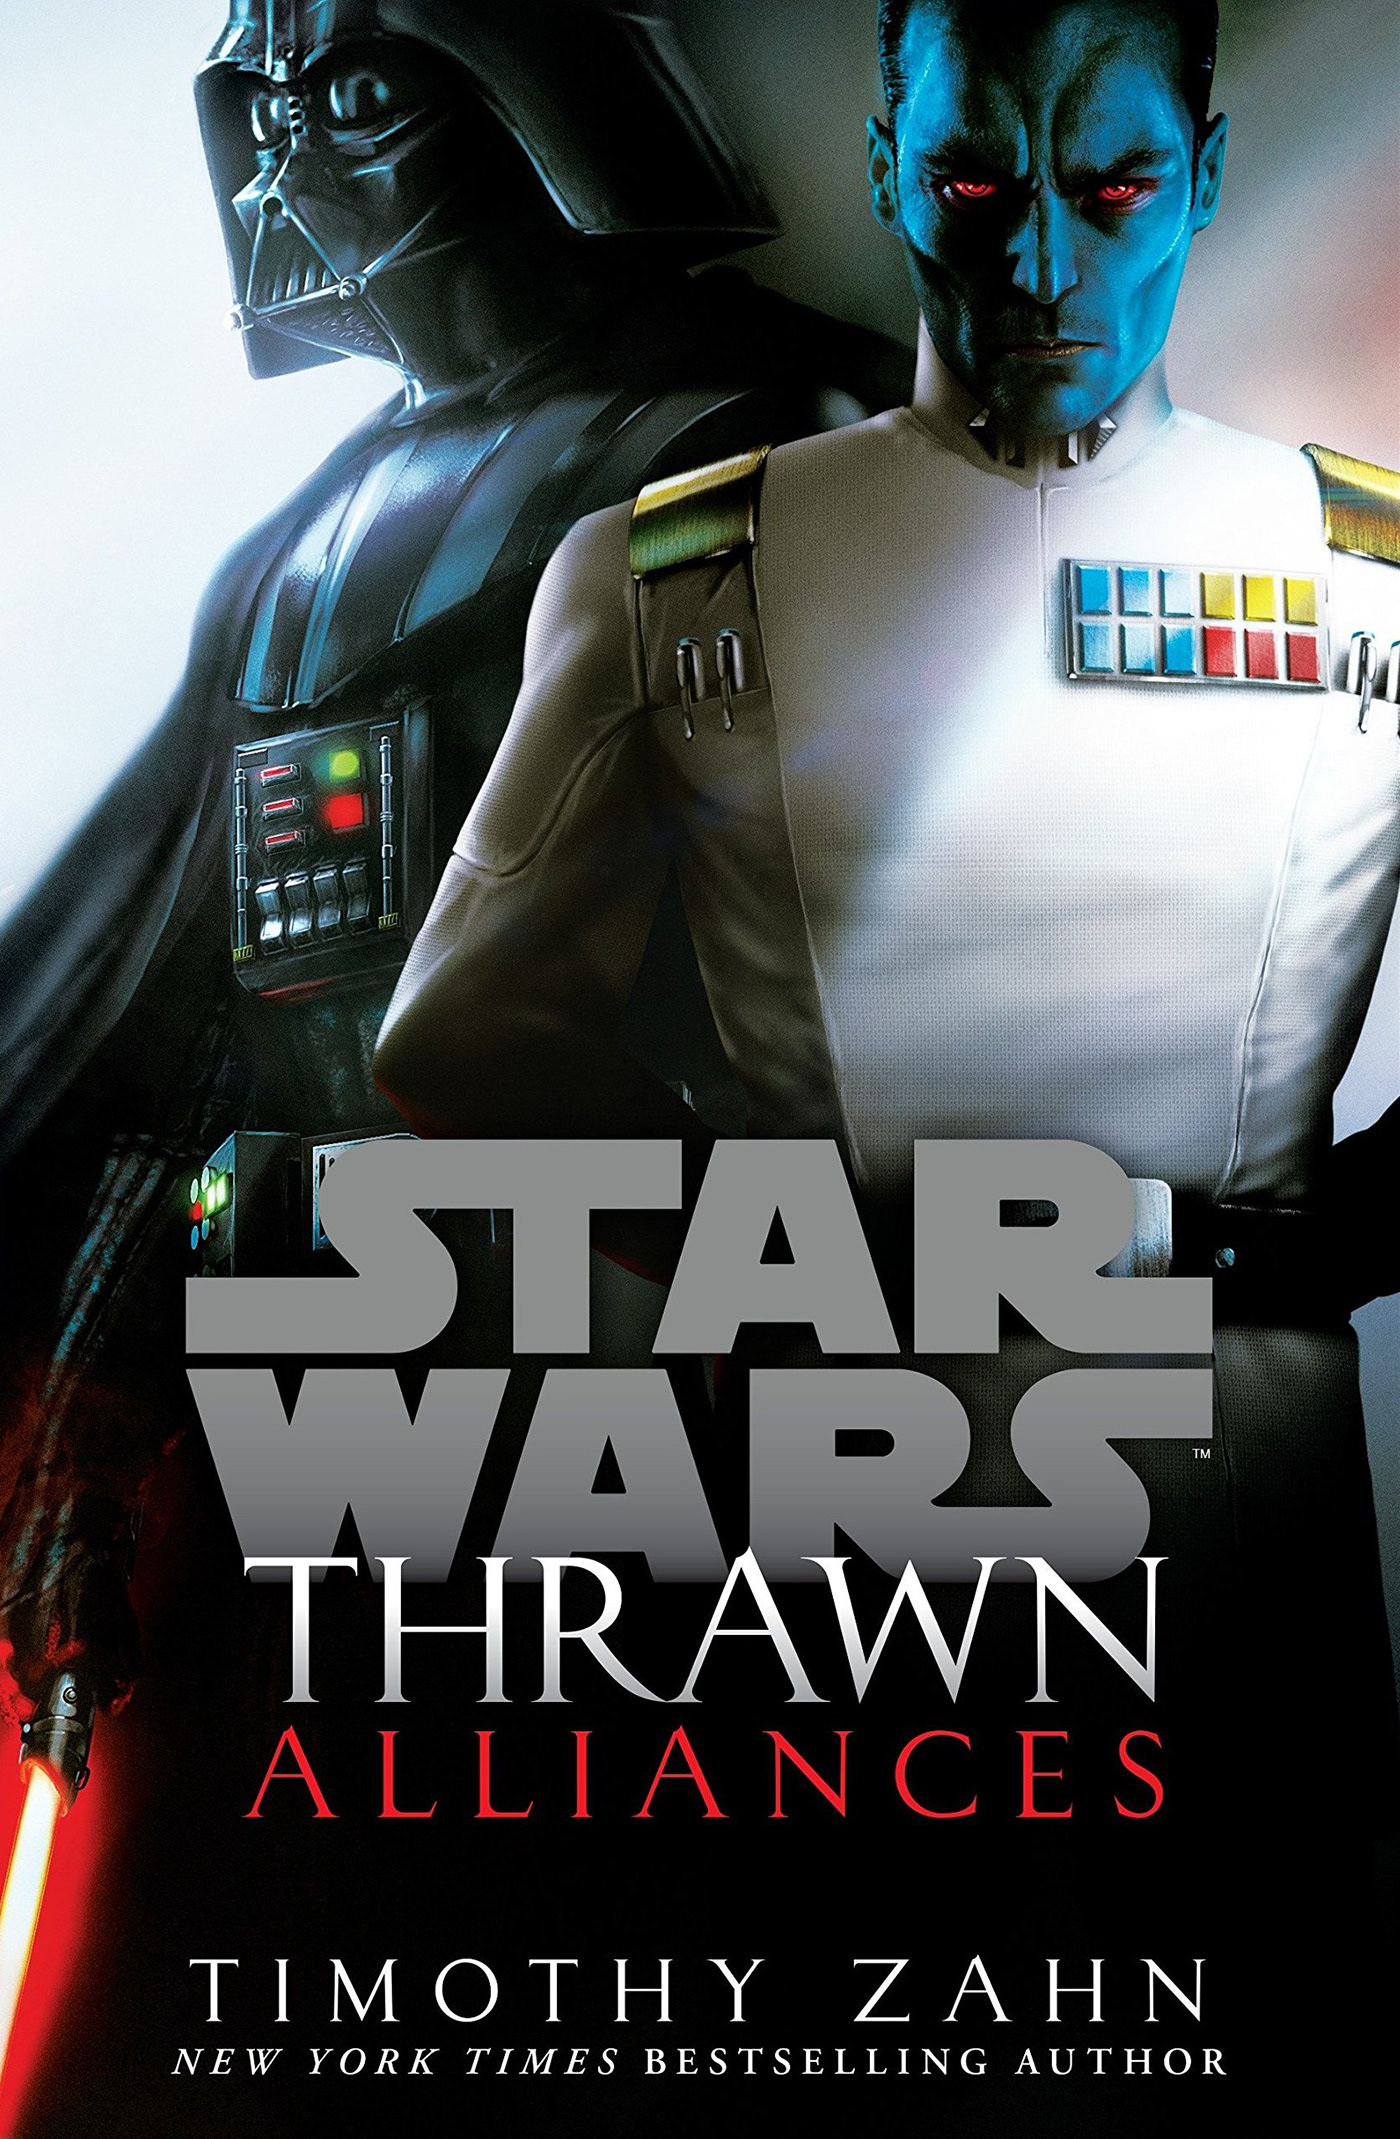 star wars darth vader thrawn villain villains Anakin book cover Lucasfilm cover Dark side